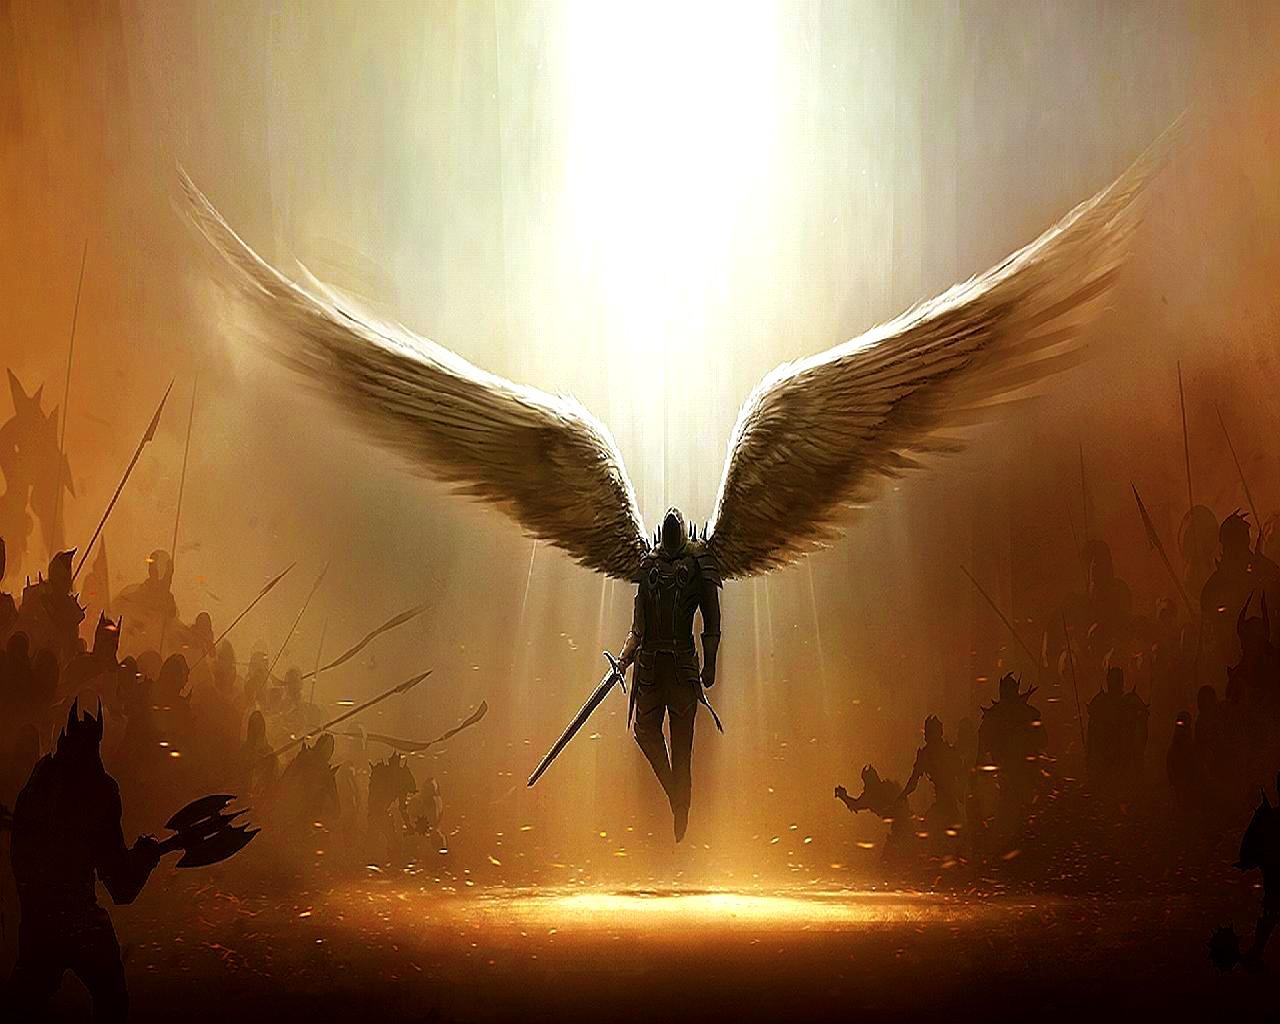 Angel fantasy 31530382 1280 1024